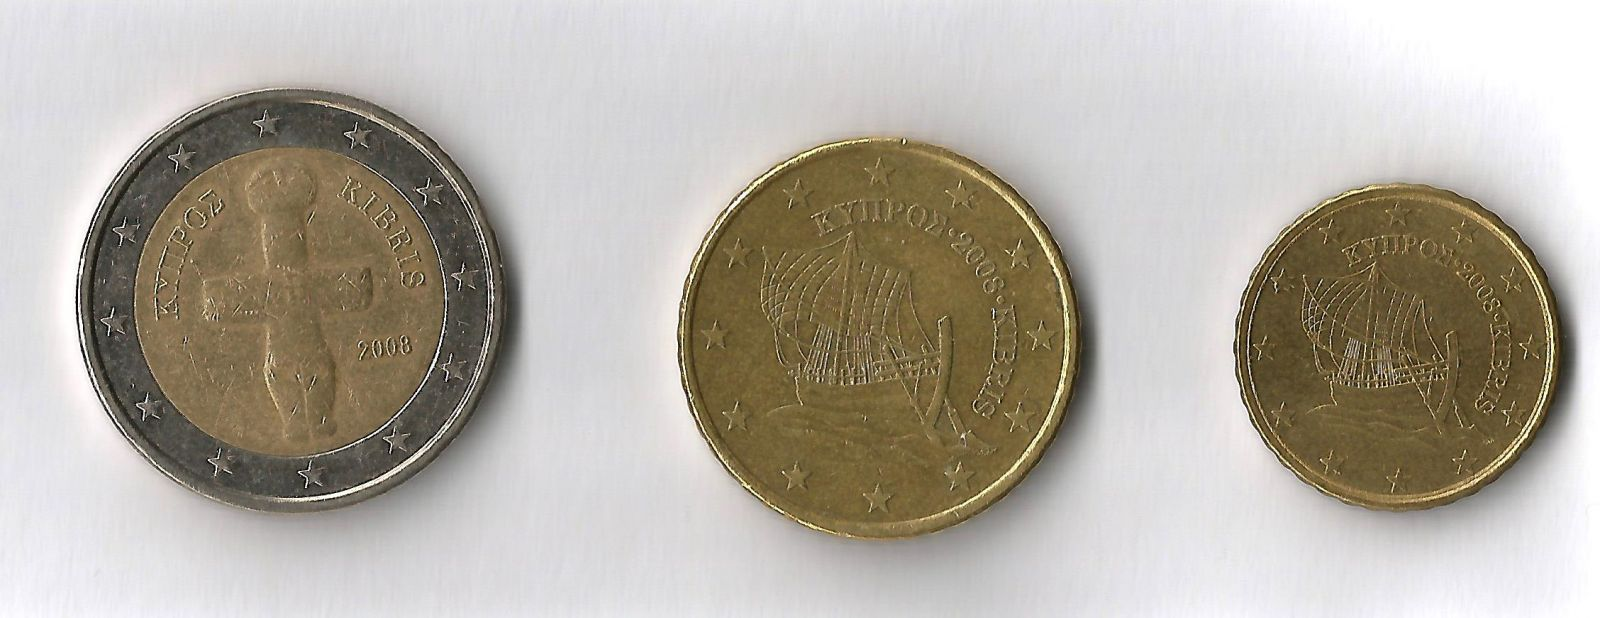 cipro 2€, 50,10 cent